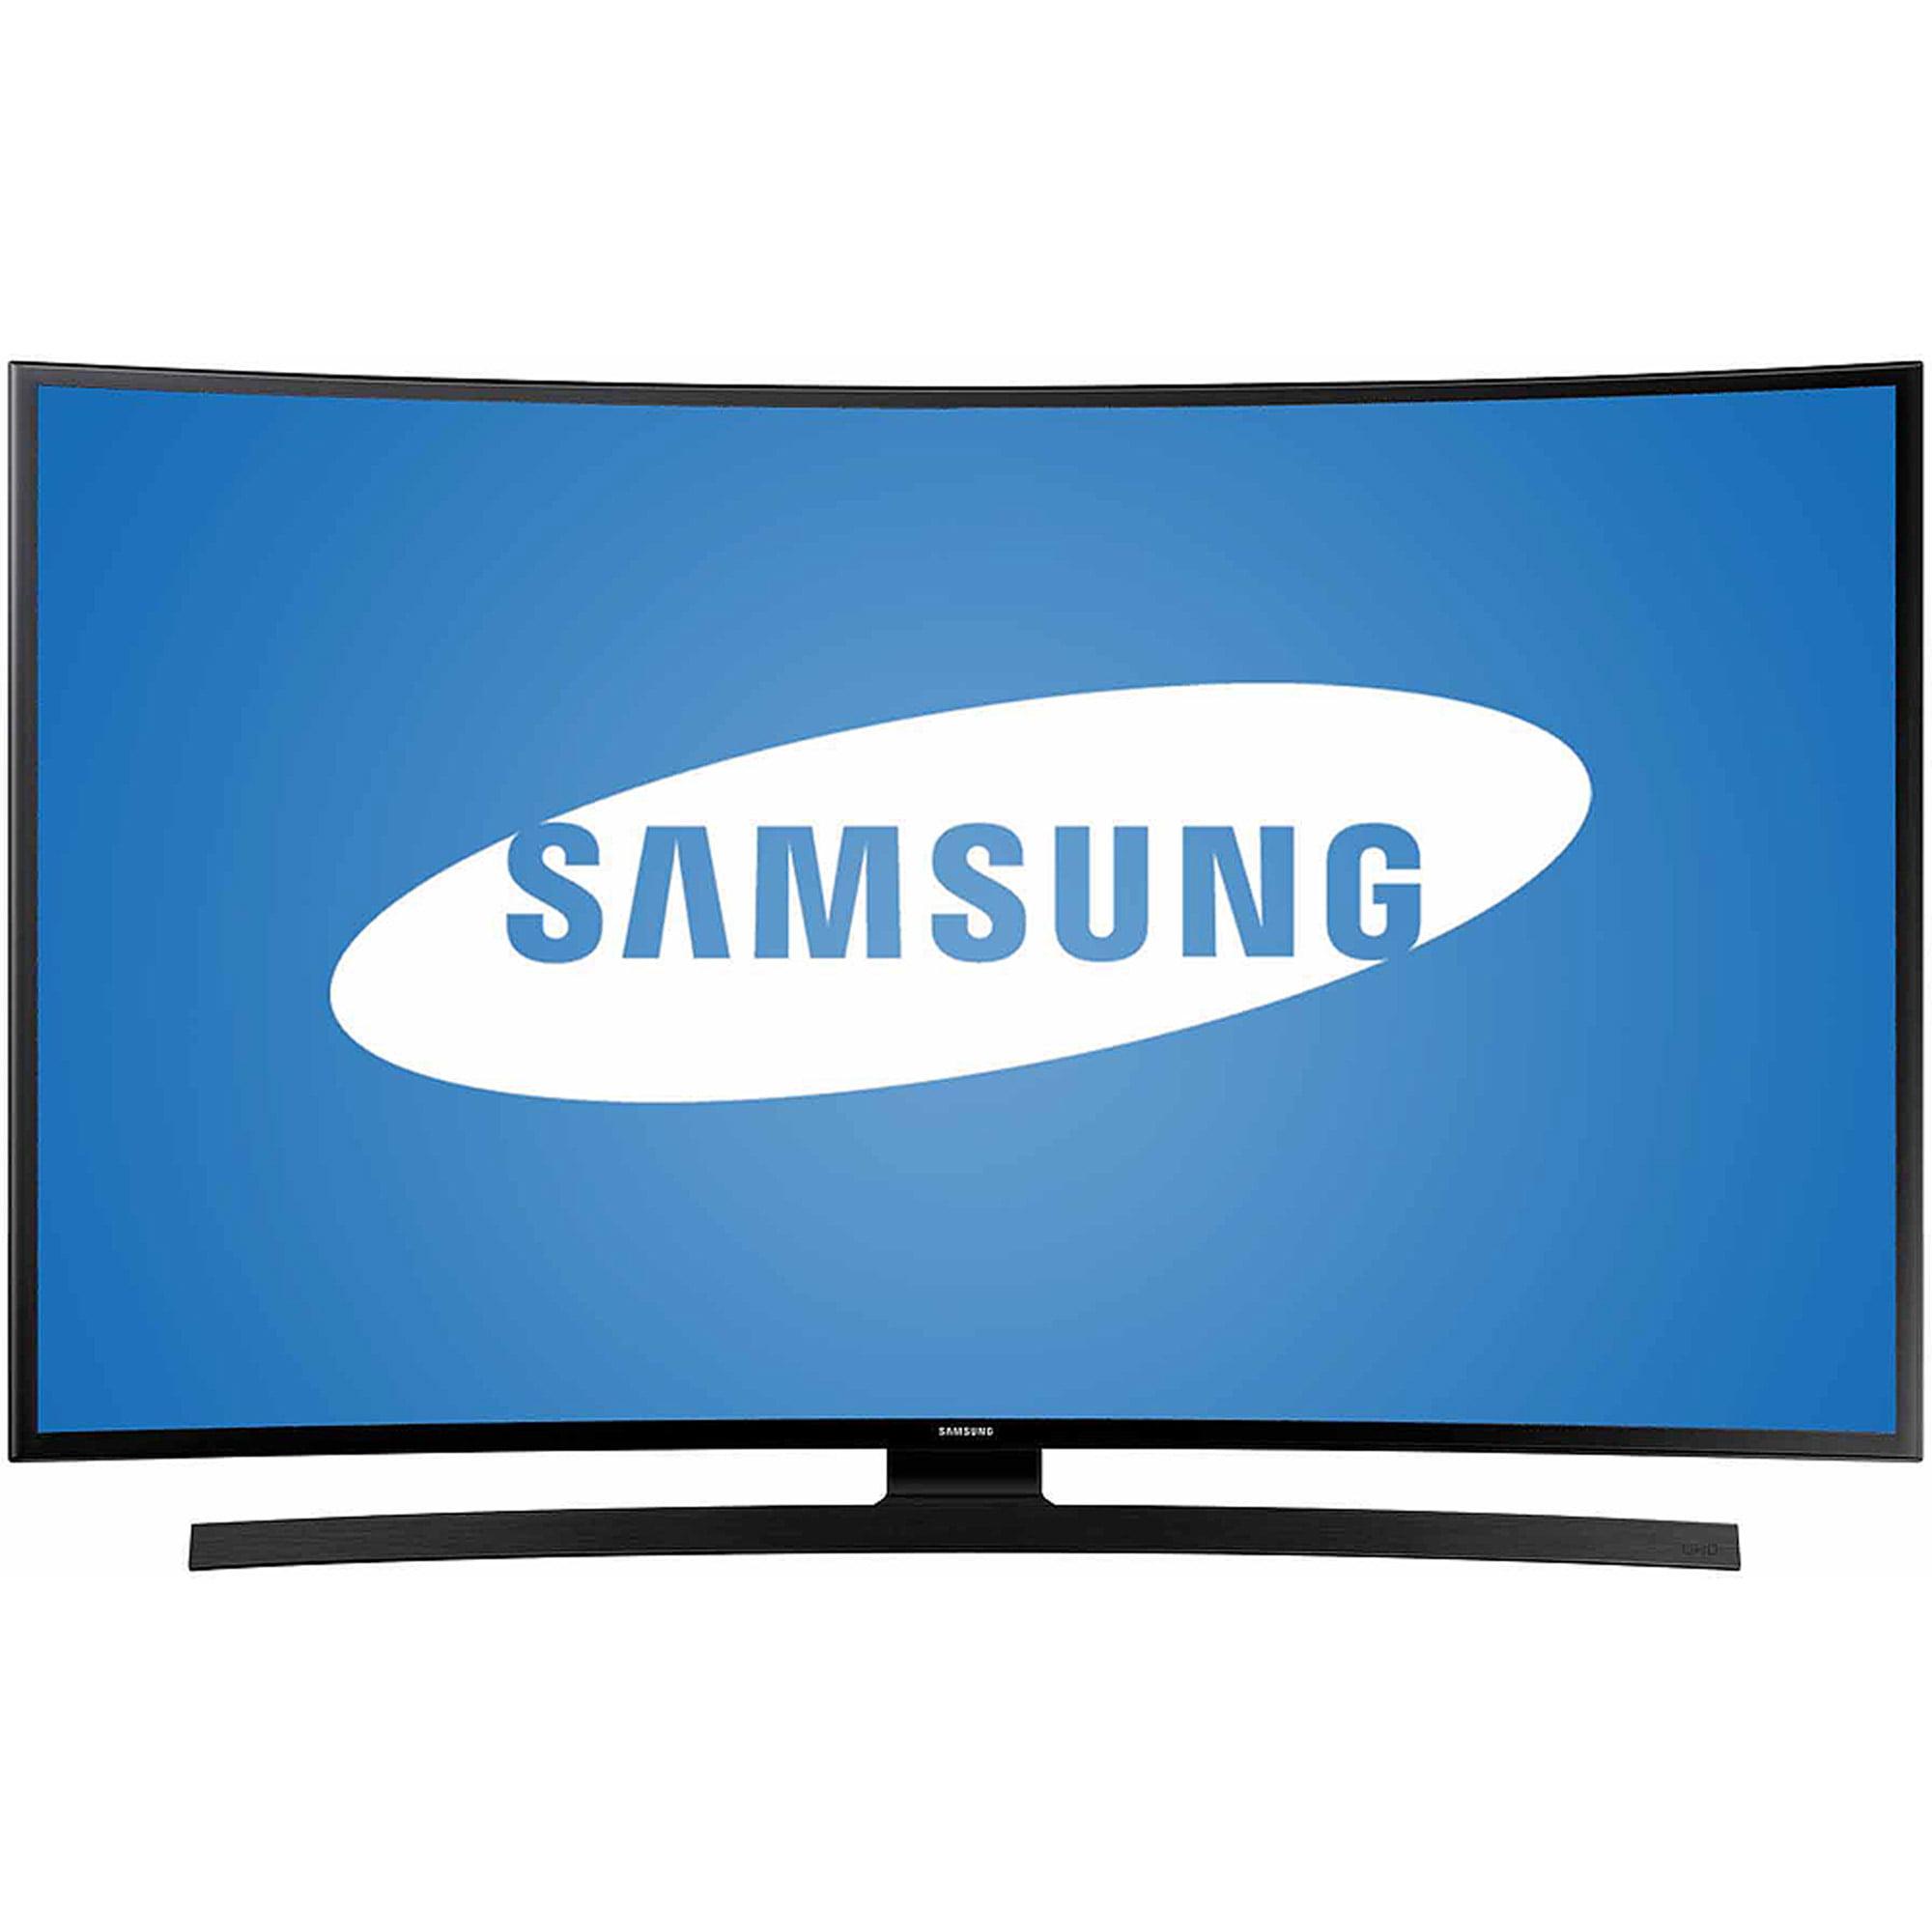 "Samsung UN55JU6700 55"" Curved 4K Ultra HD 2160p 60Hz LED Smart HDTV (4K x 2K) - Qualifies for Premium Delivery"